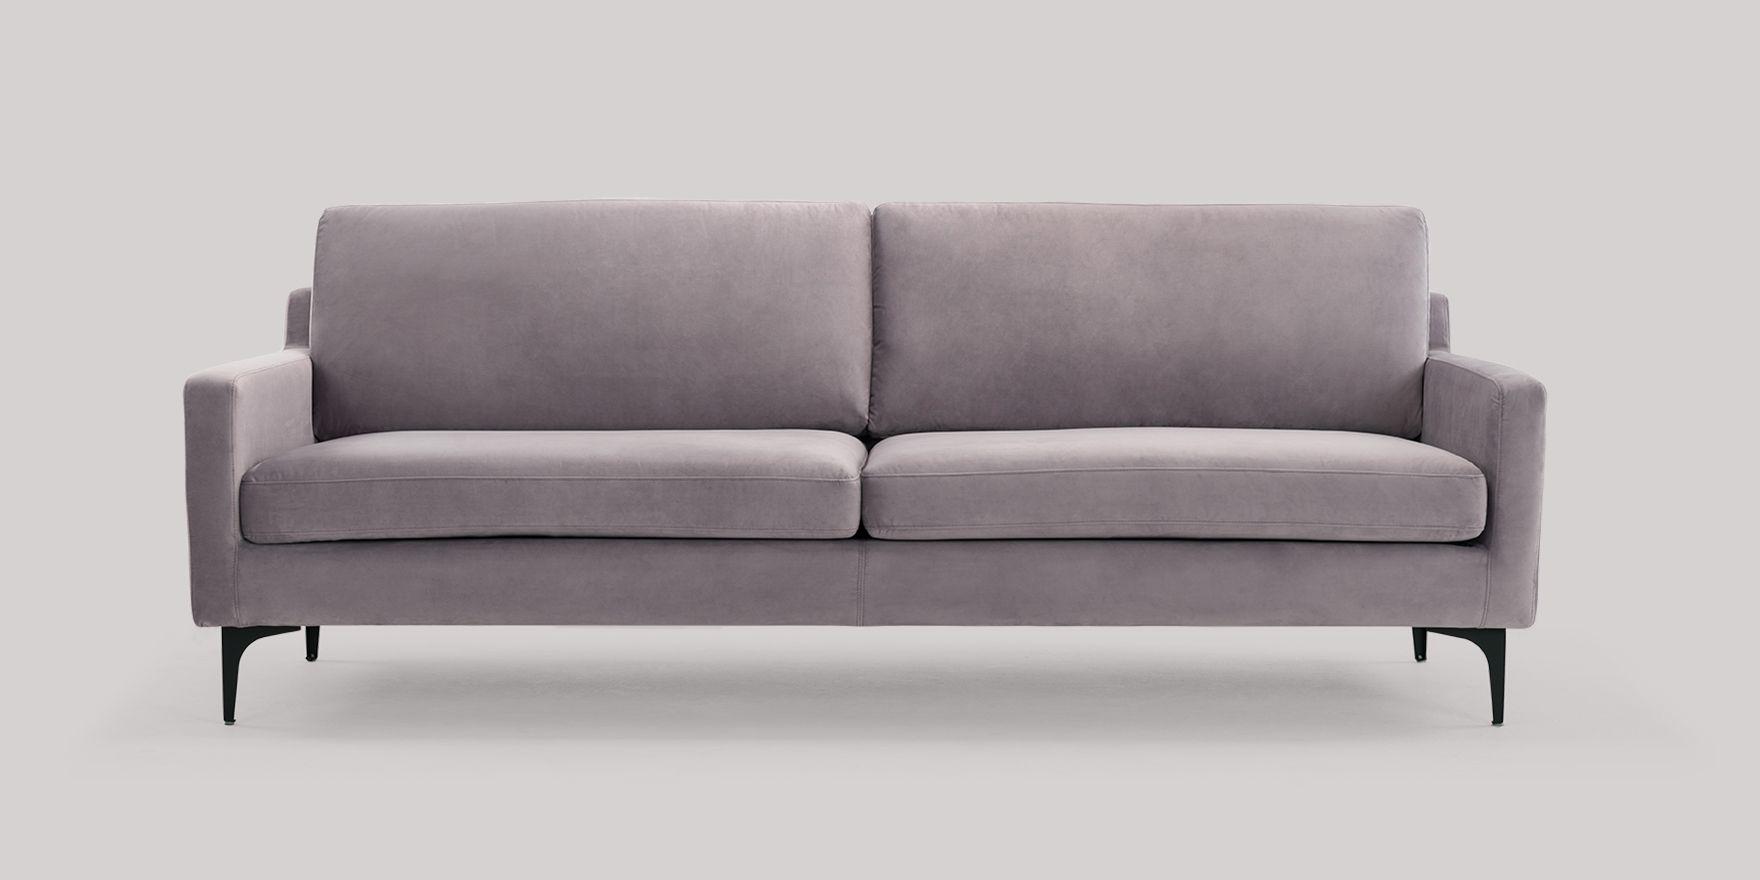 Full Size of Sofa Mit Abnehmbarem Bezug Big Waschbarer Abnehmbarer Ikea Abnehmbar Waschbar Sofas Abnehmbaren Grau Hussen Modulares Anna Auf Raten Kissen Rolf Benz Recamiere Sofa Sofa Abnehmbarer Bezug